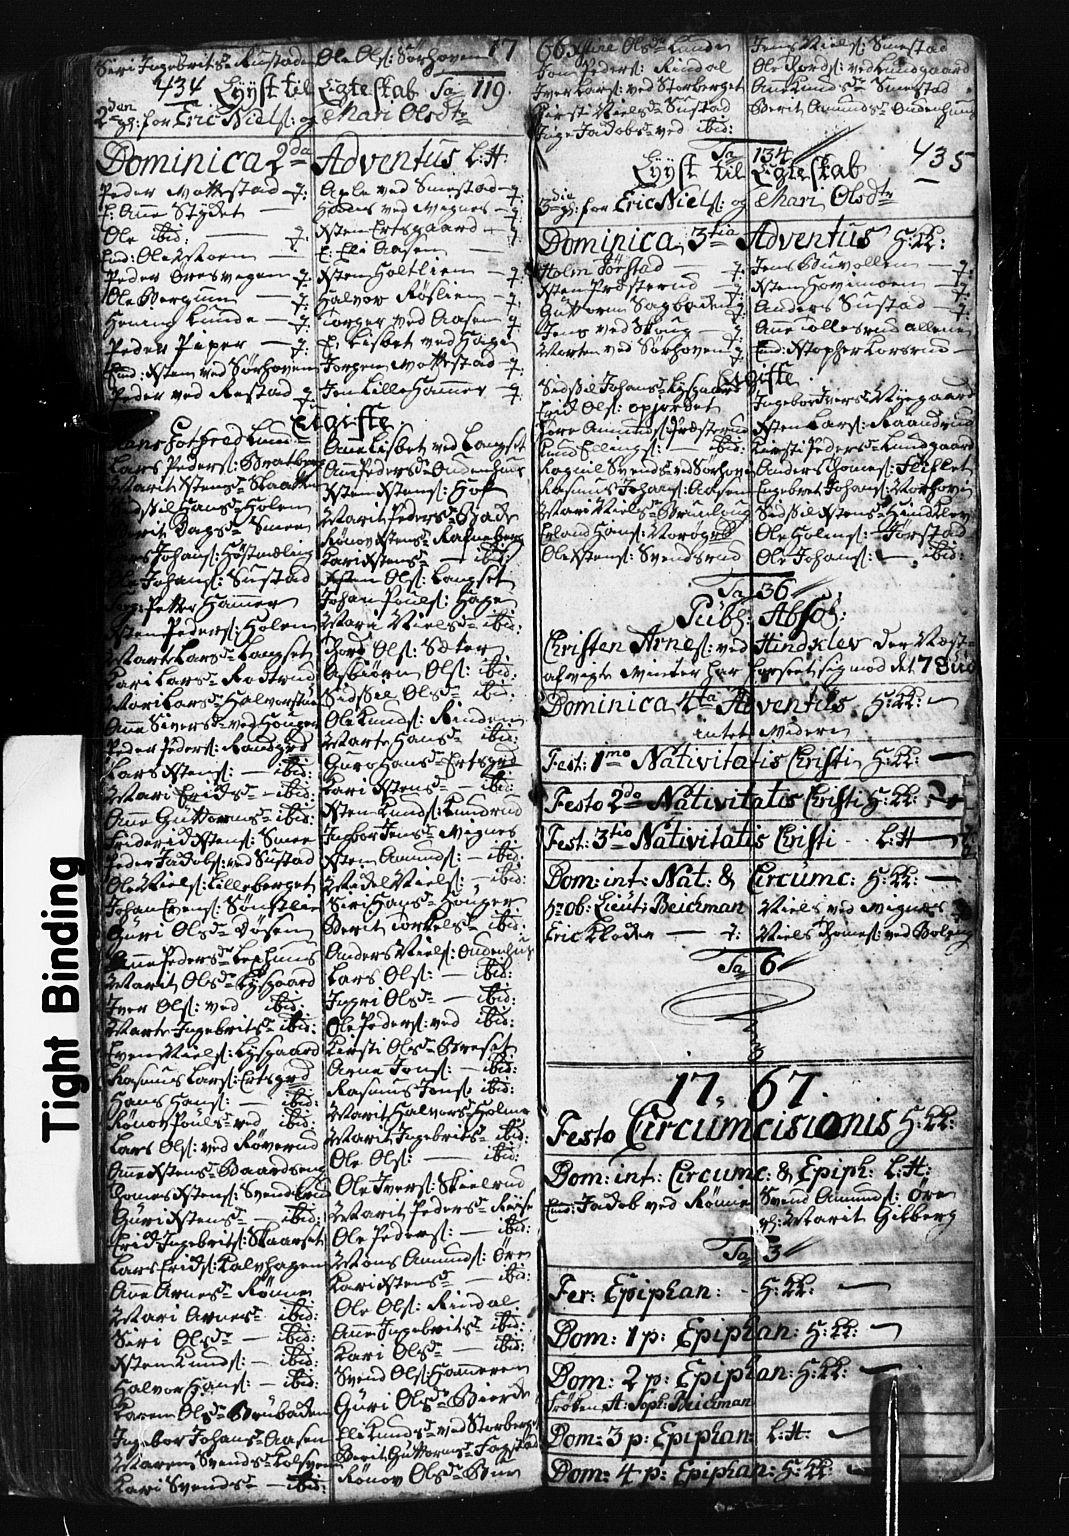 SAH, Fåberg prestekontor, Klokkerbok nr. 1, 1727-1767, s. 434-435